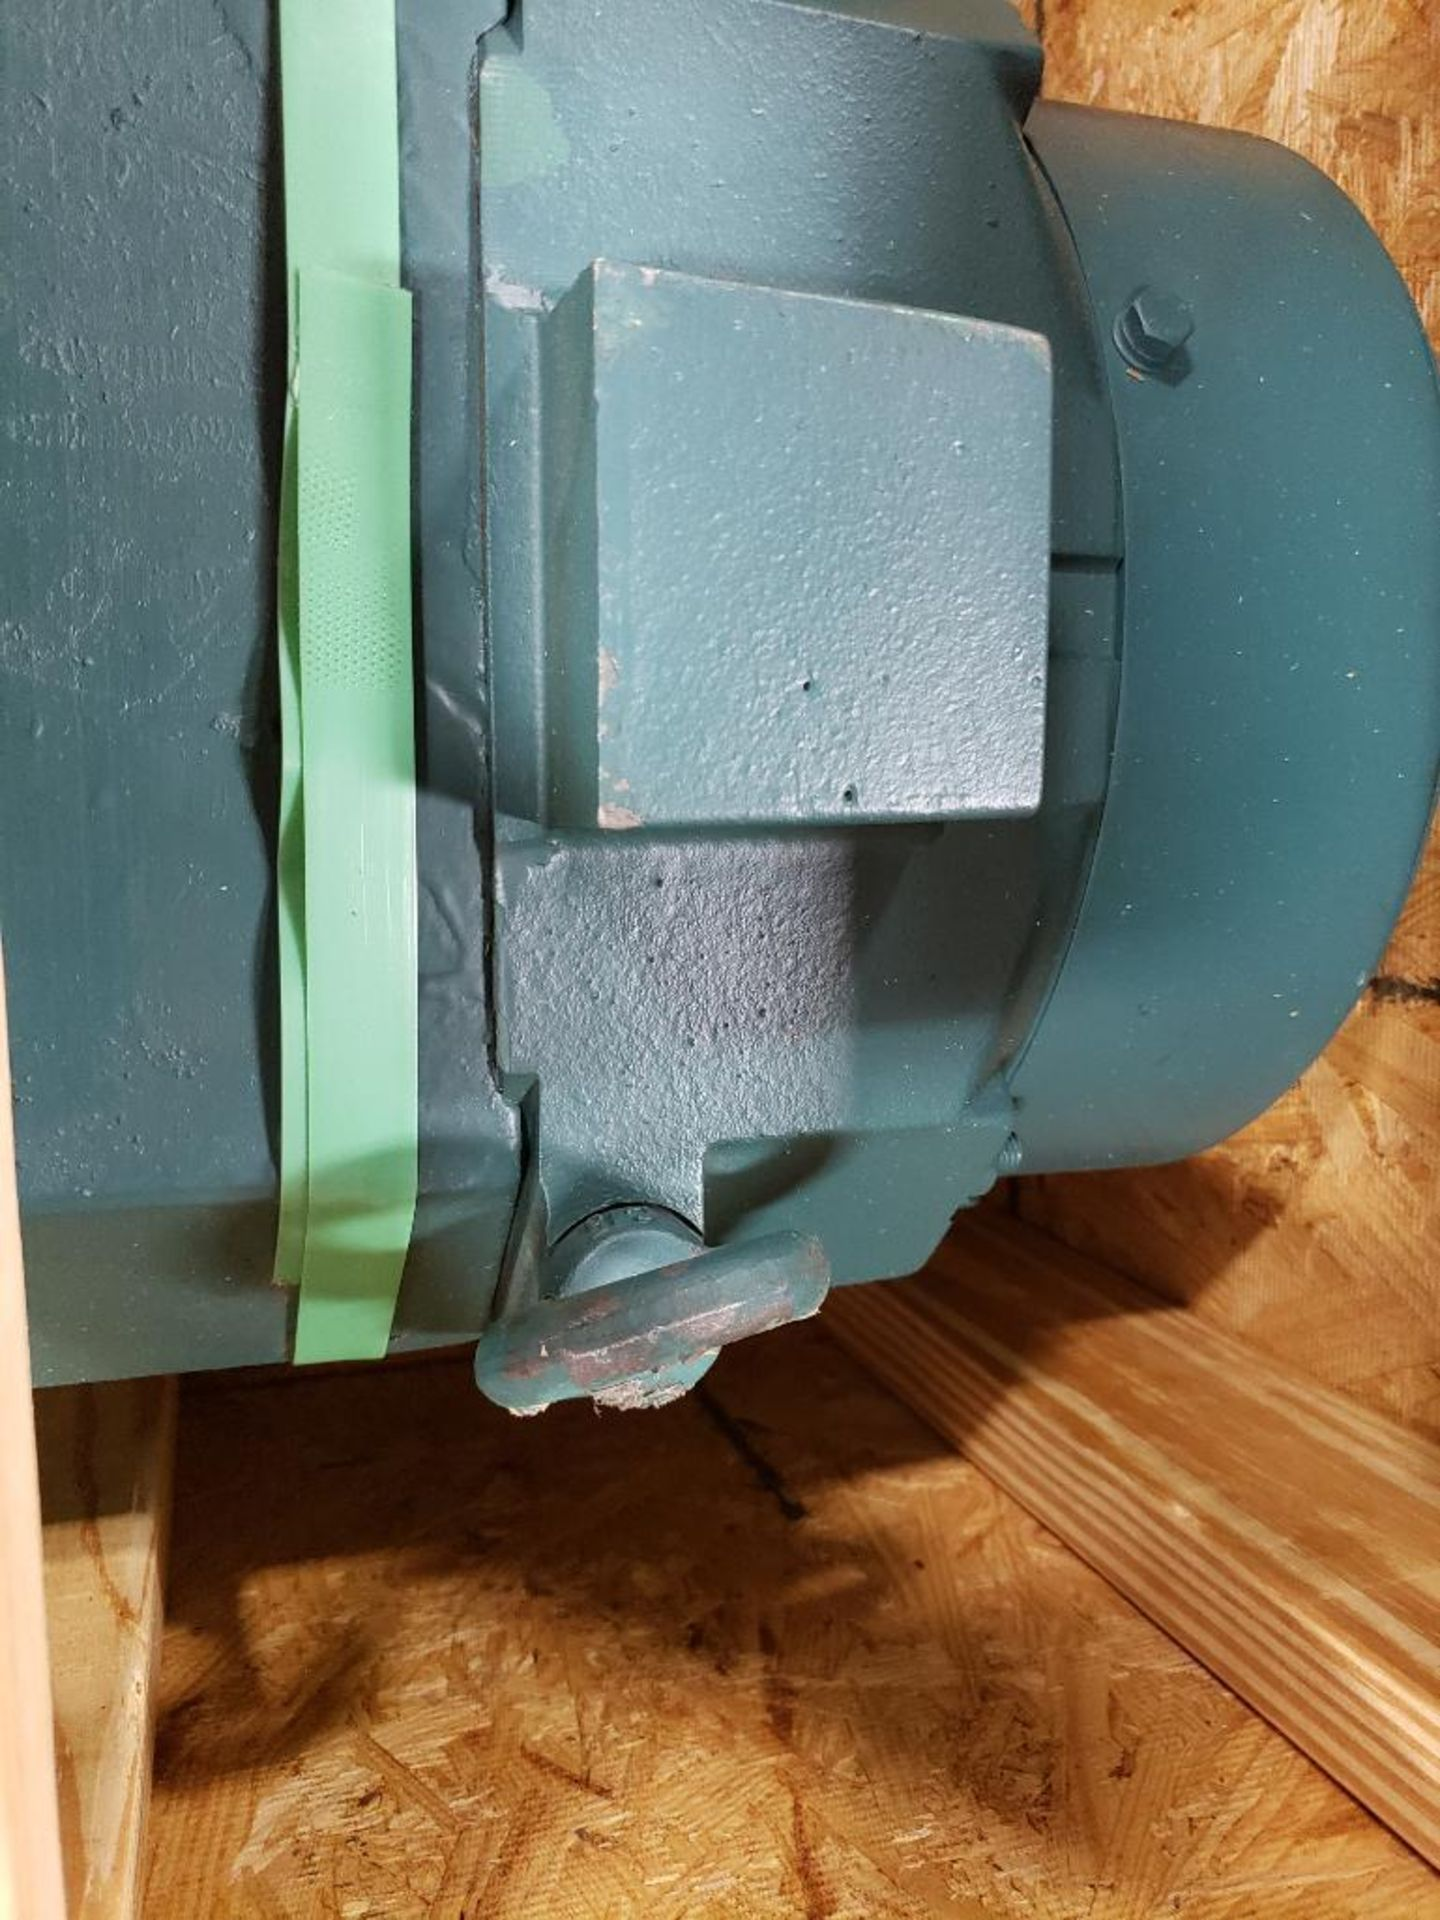 30kW Siemens 3PH Motor. 6583192-1-EGT1. 280V, 3550RM, L2564-Frame. - Image 7 of 7